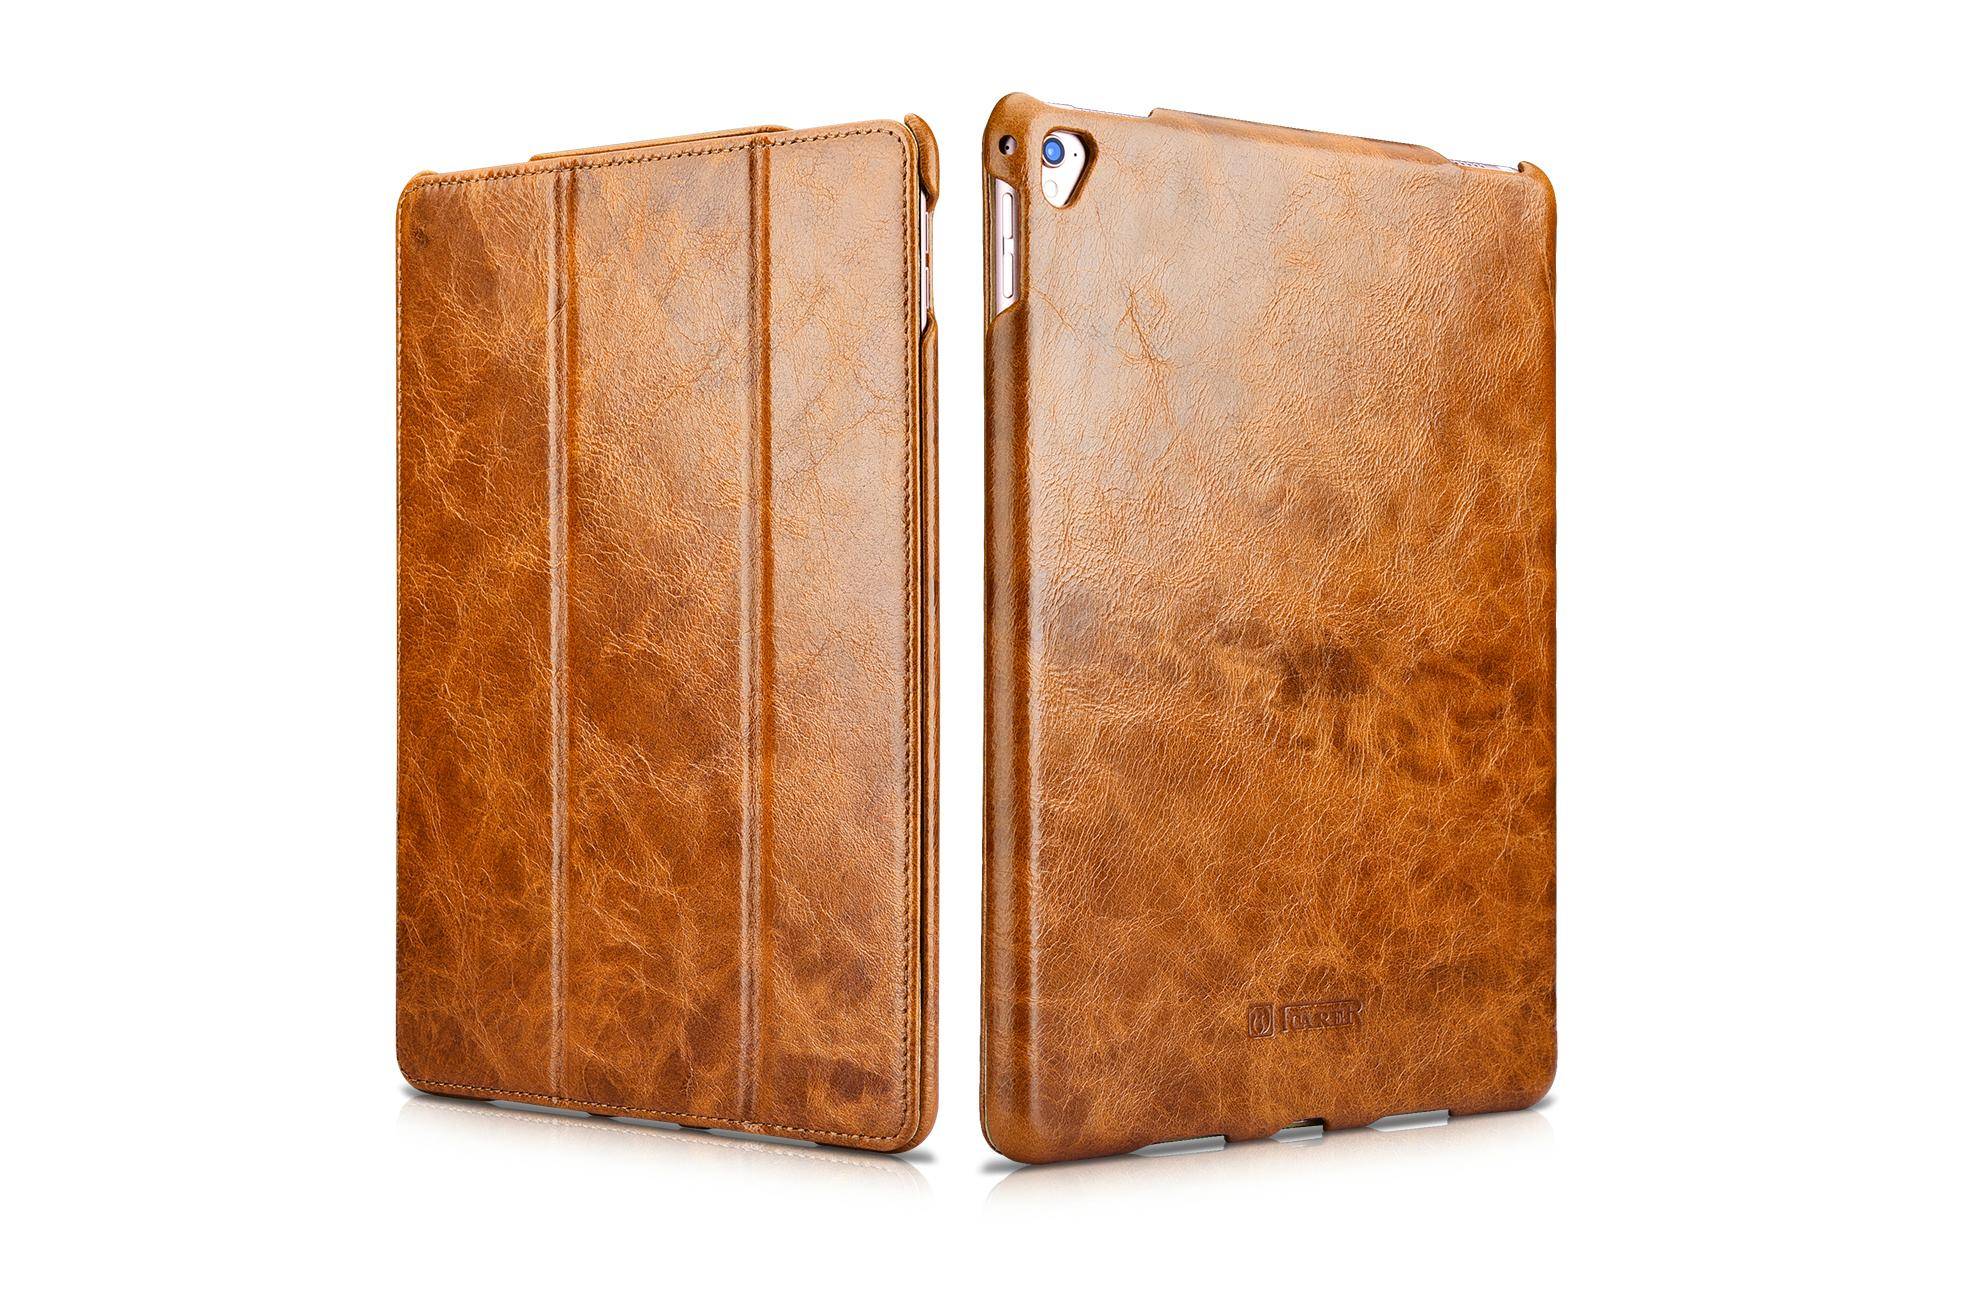 iCarer iPad Pro 9.7 inch Oil Wax Vintage Genuine Leather Folio Case 2